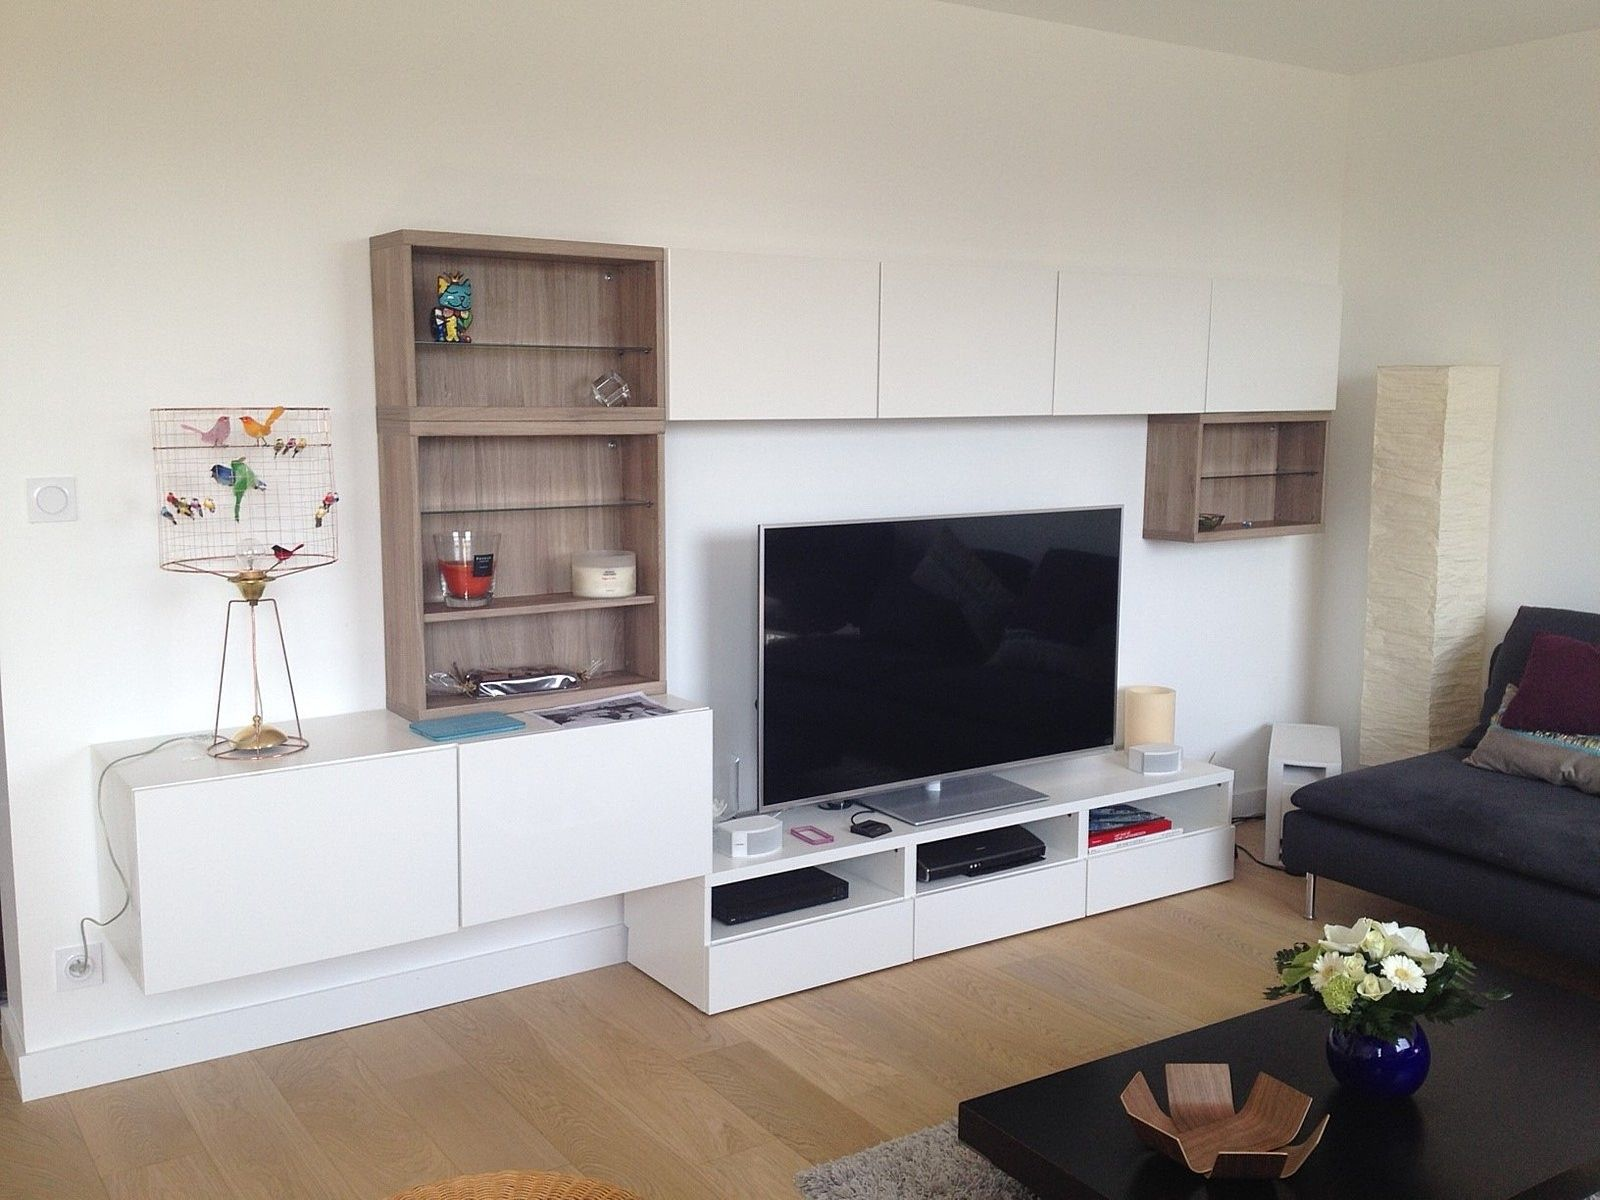 living room storage units overstock com furniture ordinary modern style part 5 ikea besta ideas